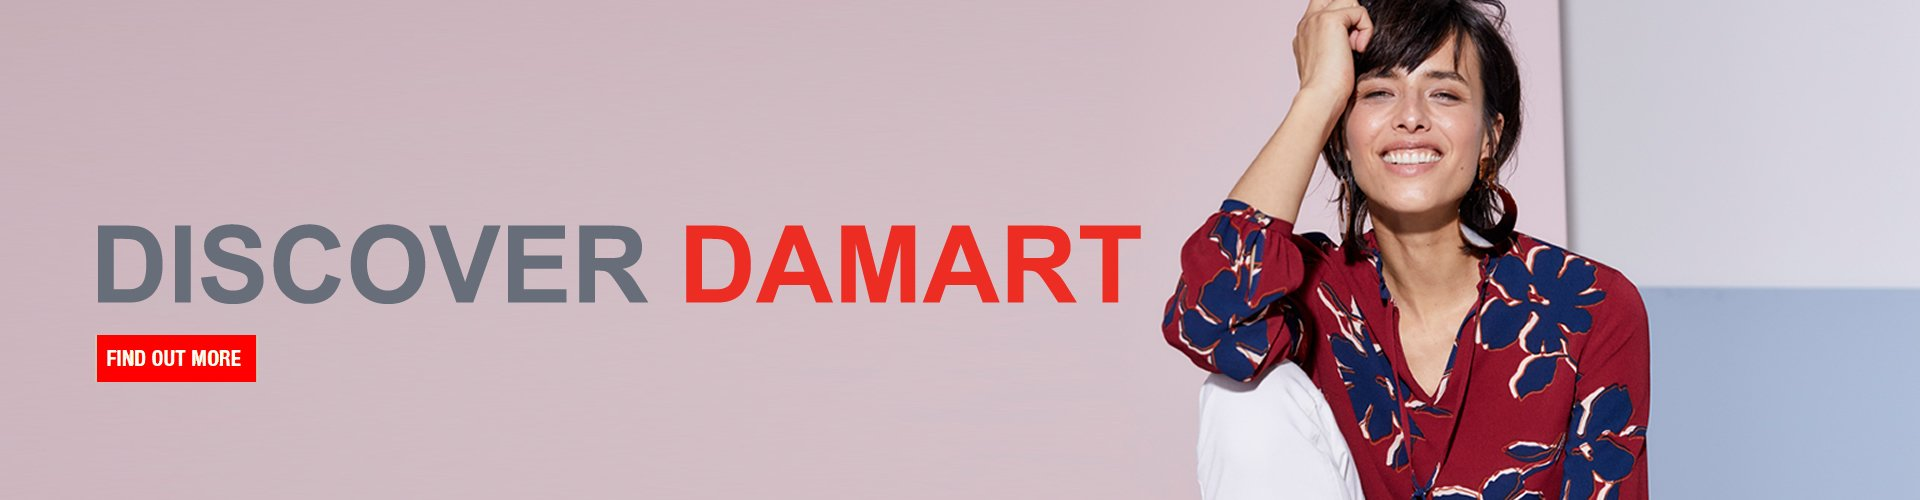 discover damart 2021